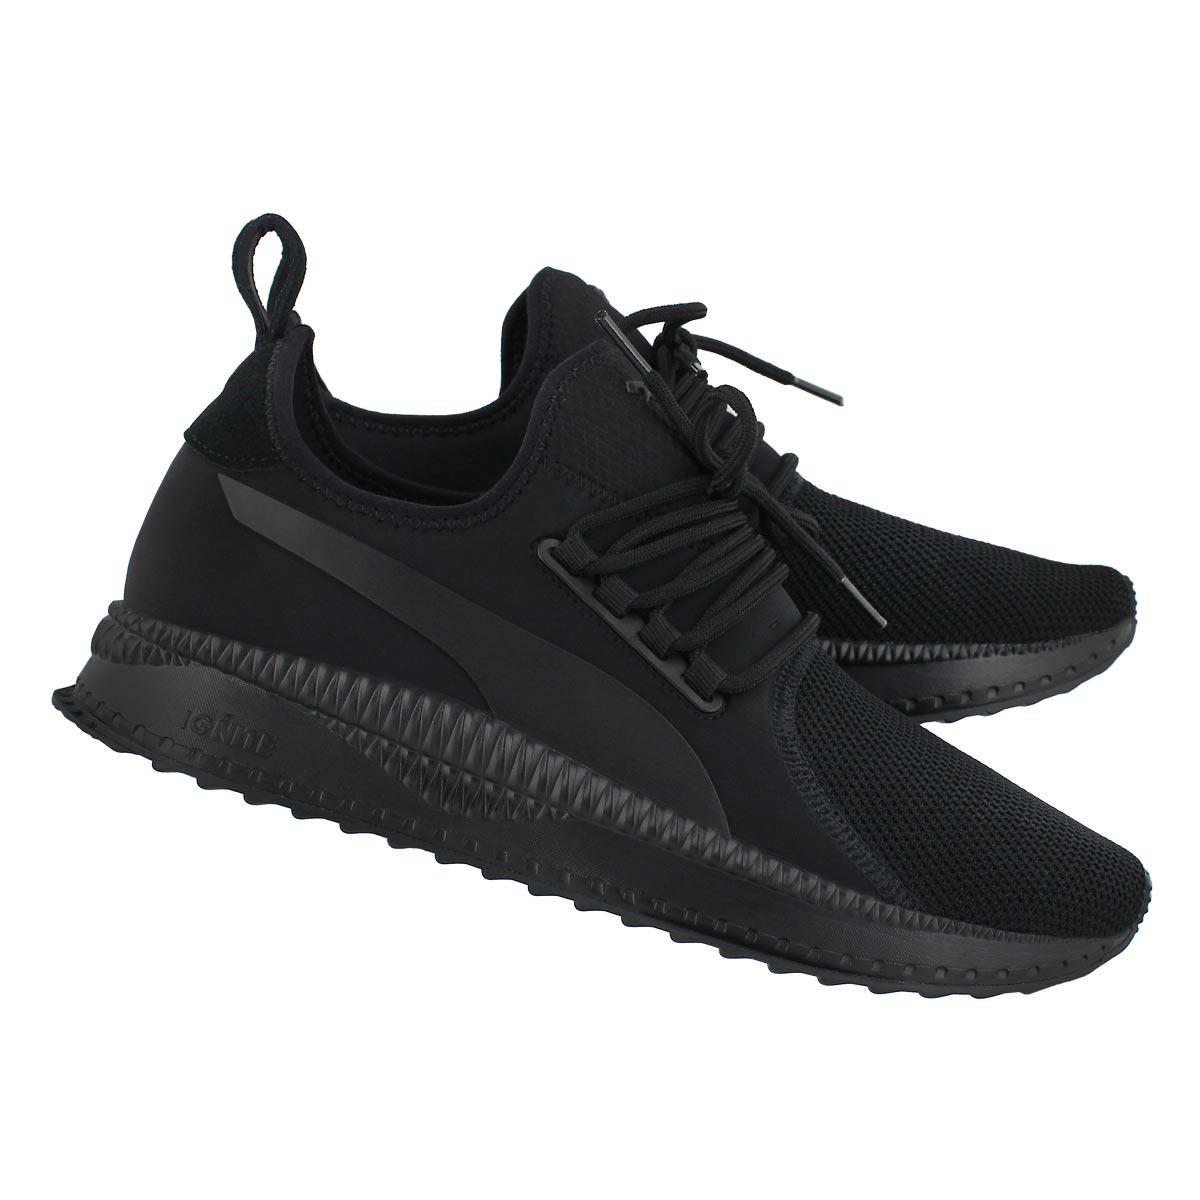 Mns TSUGI Apex black slip on sneaker